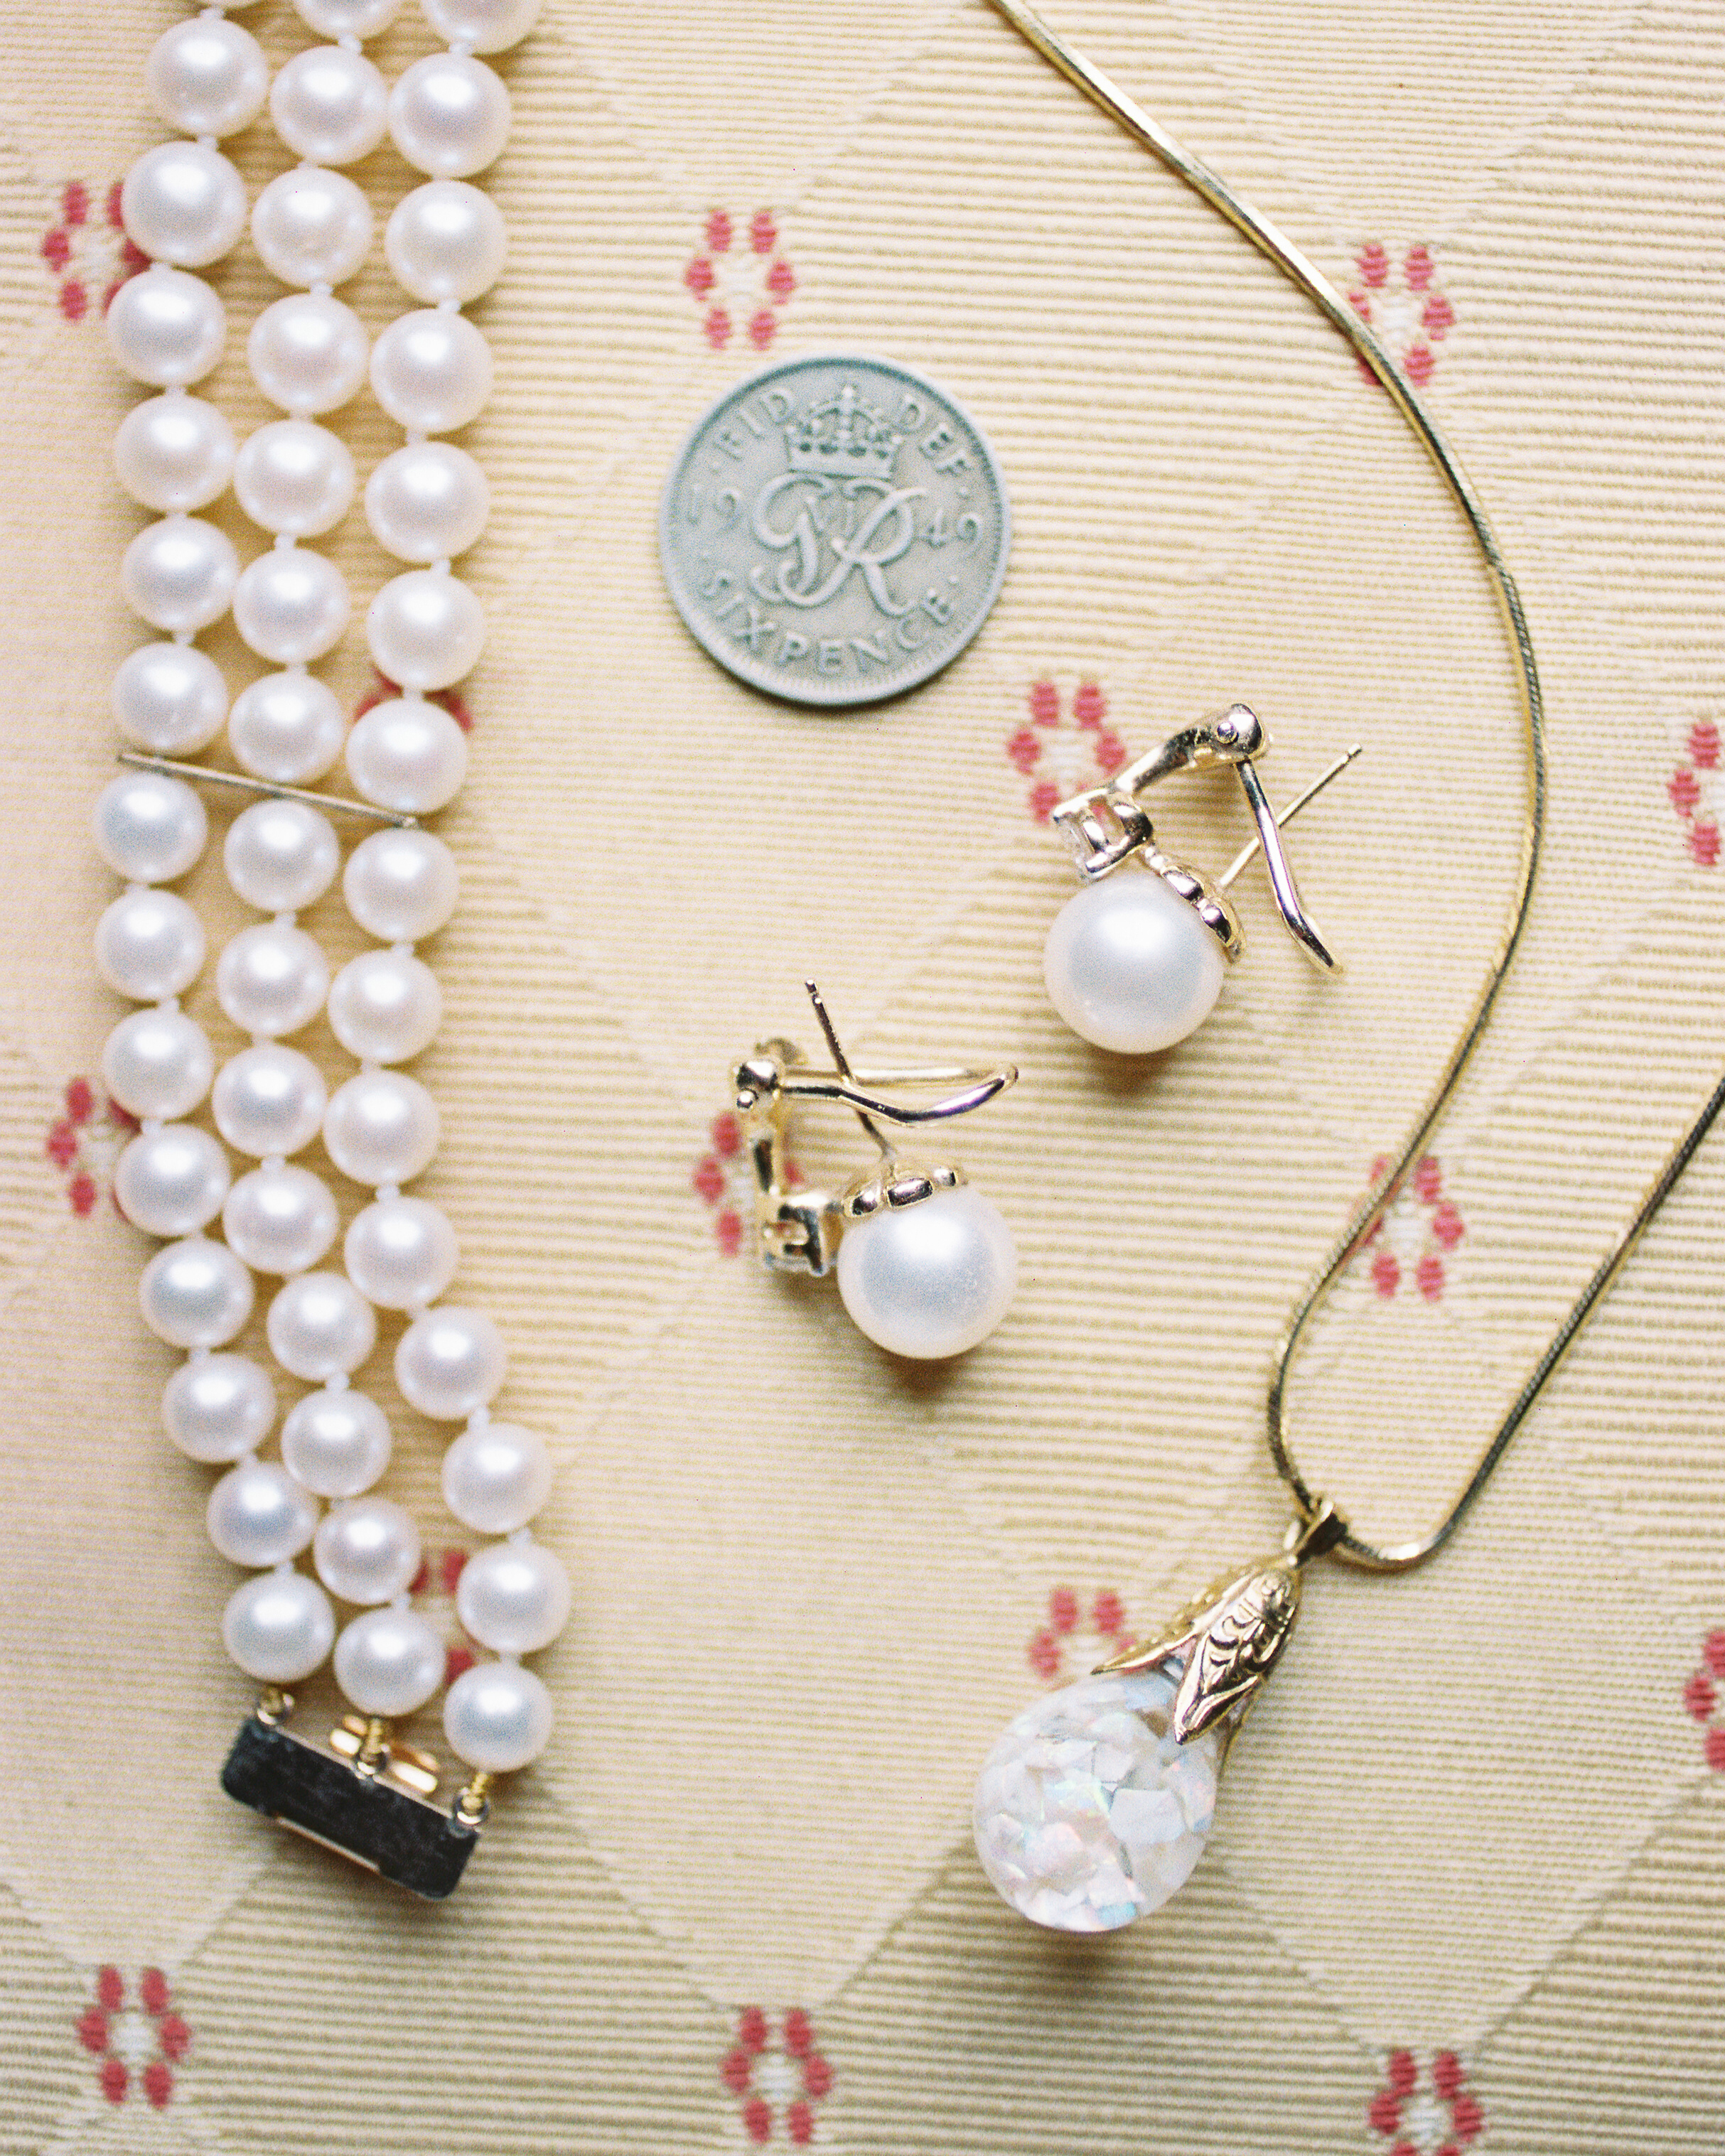 molly-patrick-wedding-jewelry-3084-s111760-0115.jpg